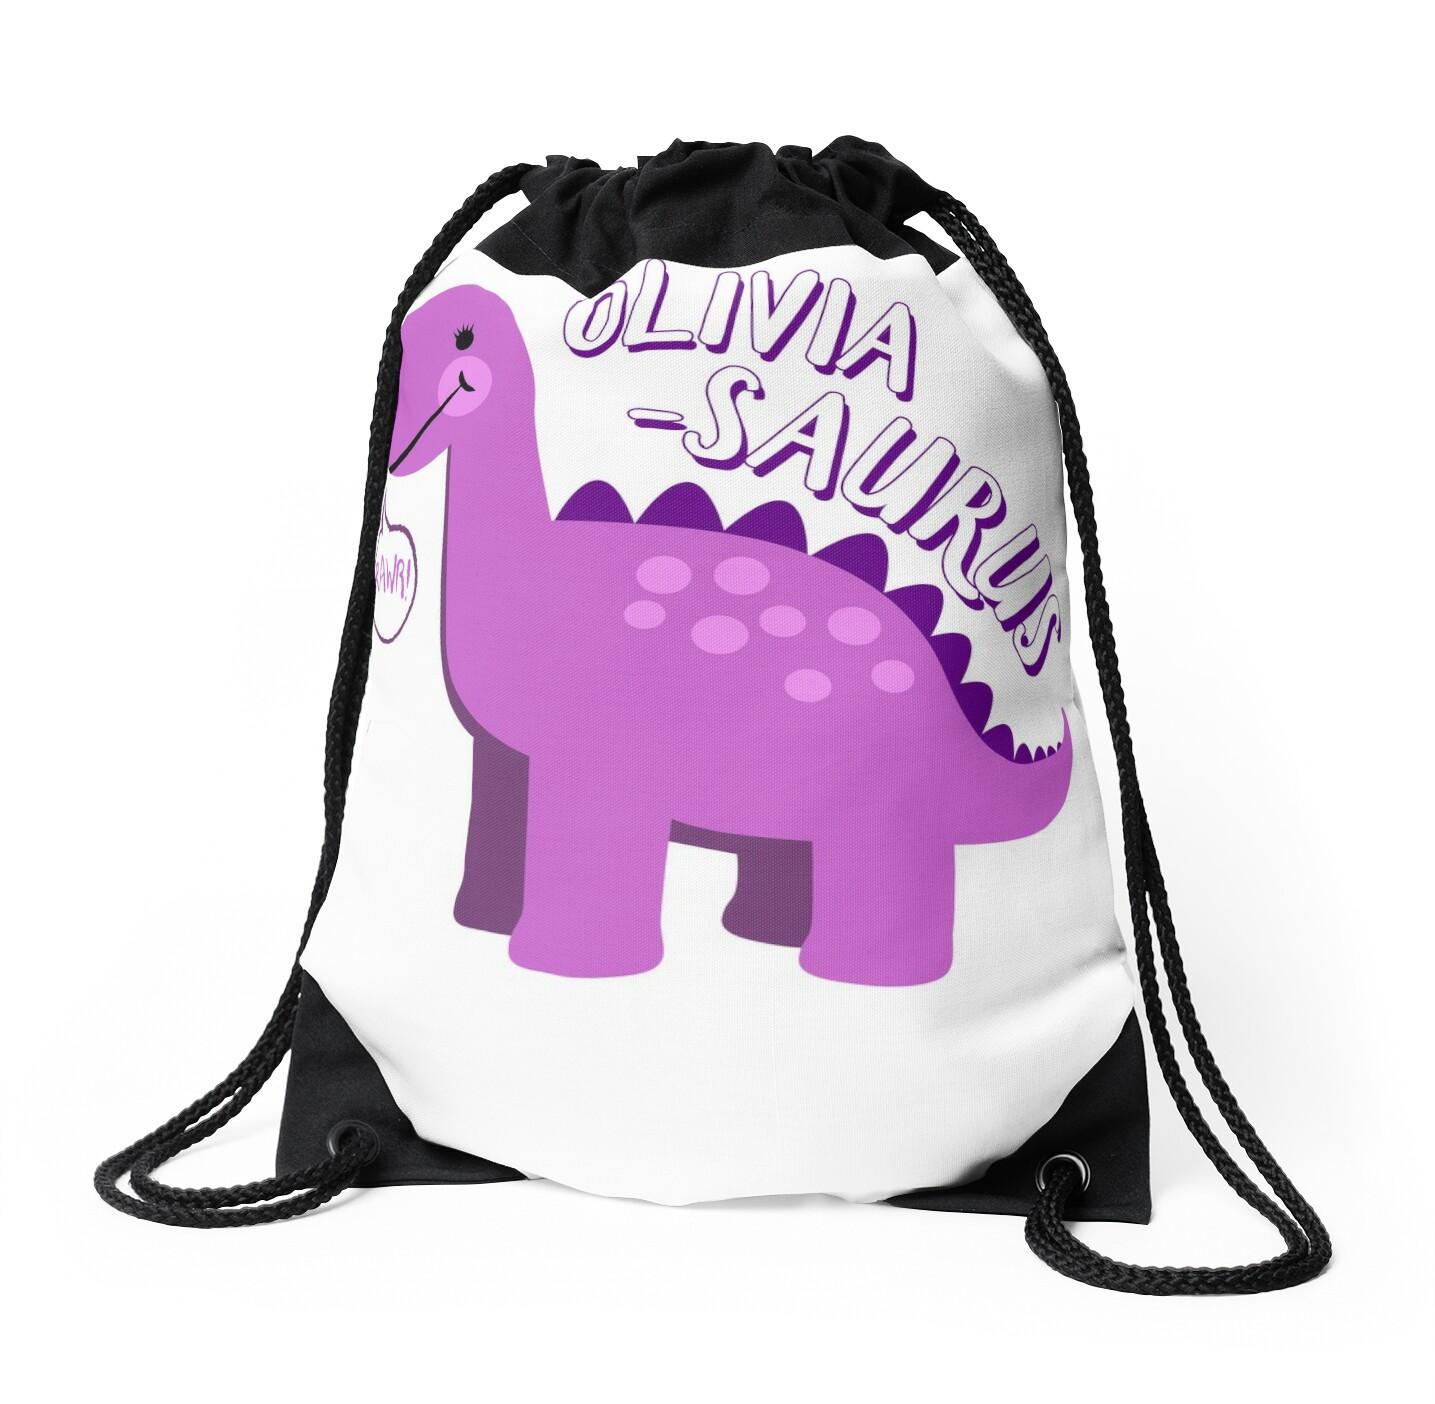 Olivia Saurus Dinosaur Name - Fun Cute Personalized